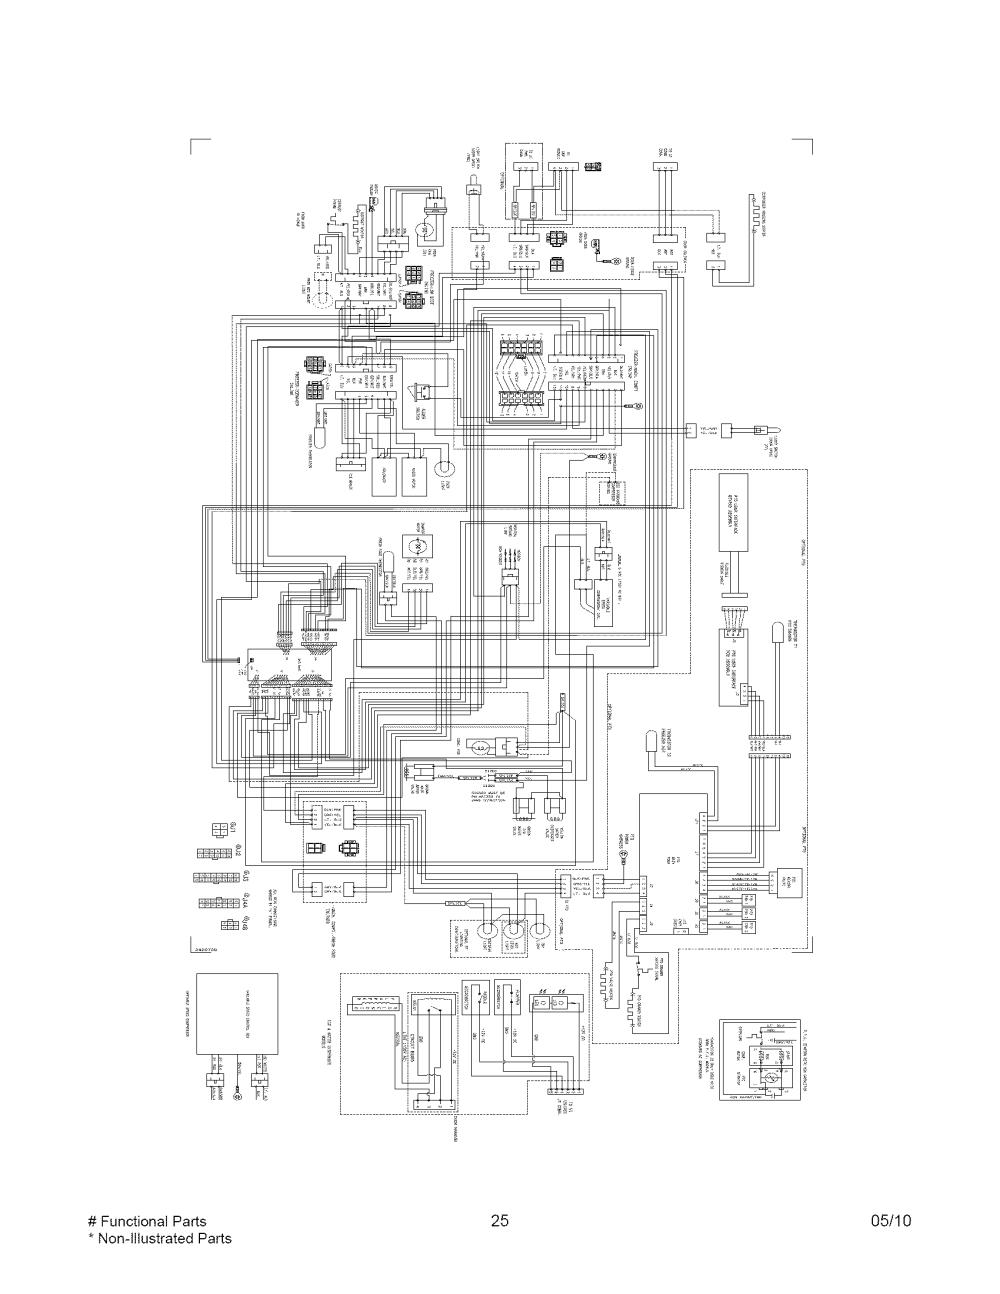 medium resolution of refrigerator wiring diagram on electrolux refrigerator wiring diagrams